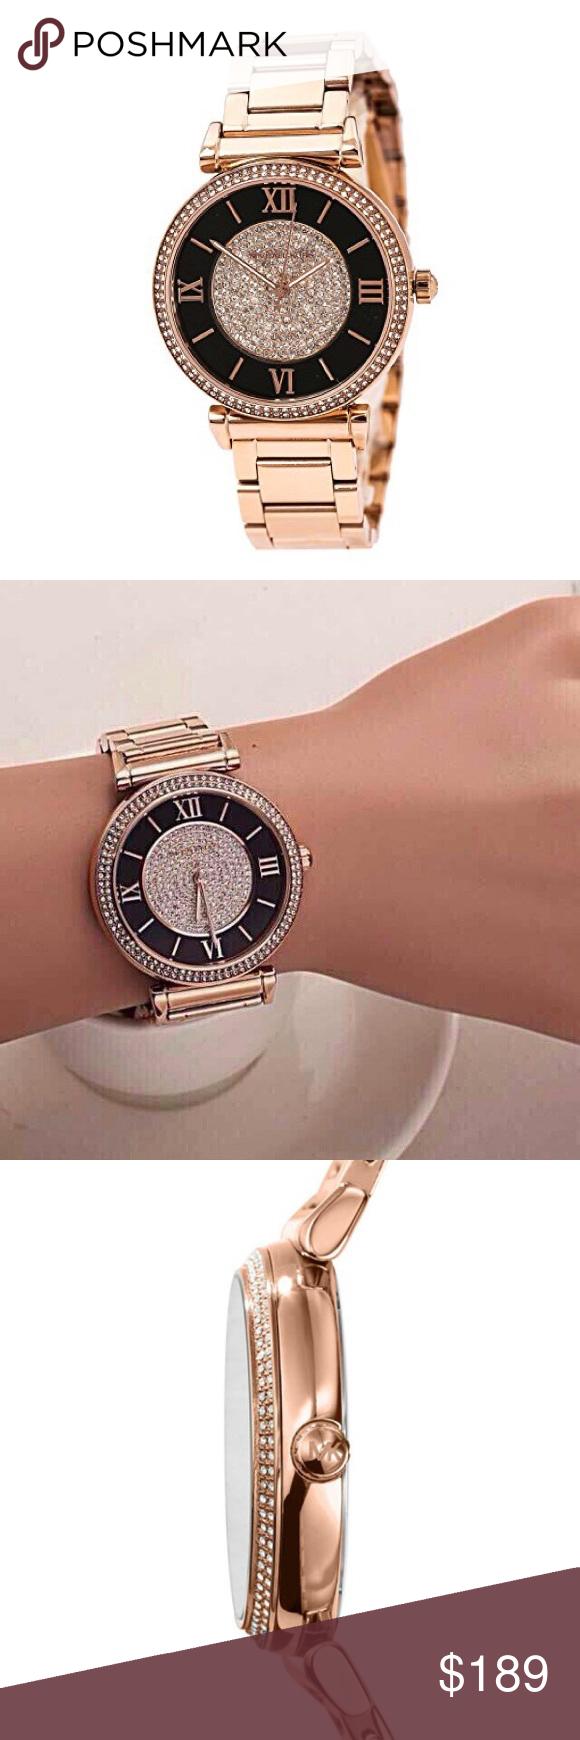 74325bf10a5d Michael Kors mk3339 Catlin Black   Rose Gold Watch Authentic Michael Kors  Ladies Catlin Watch Black